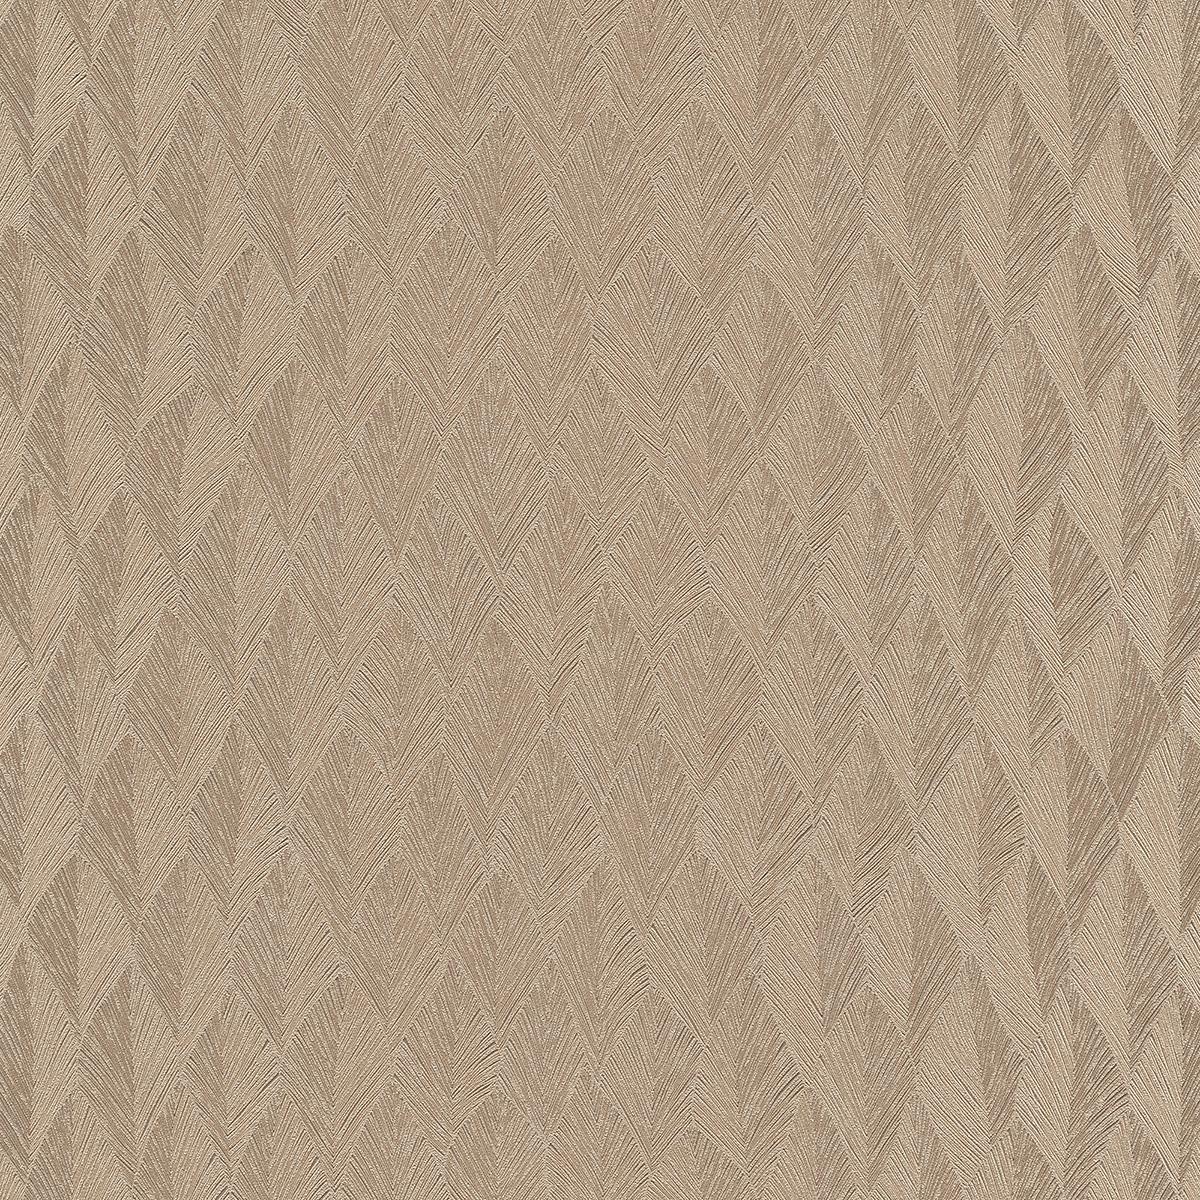 тапет Фешън 4Уолс златен отпечатък листа